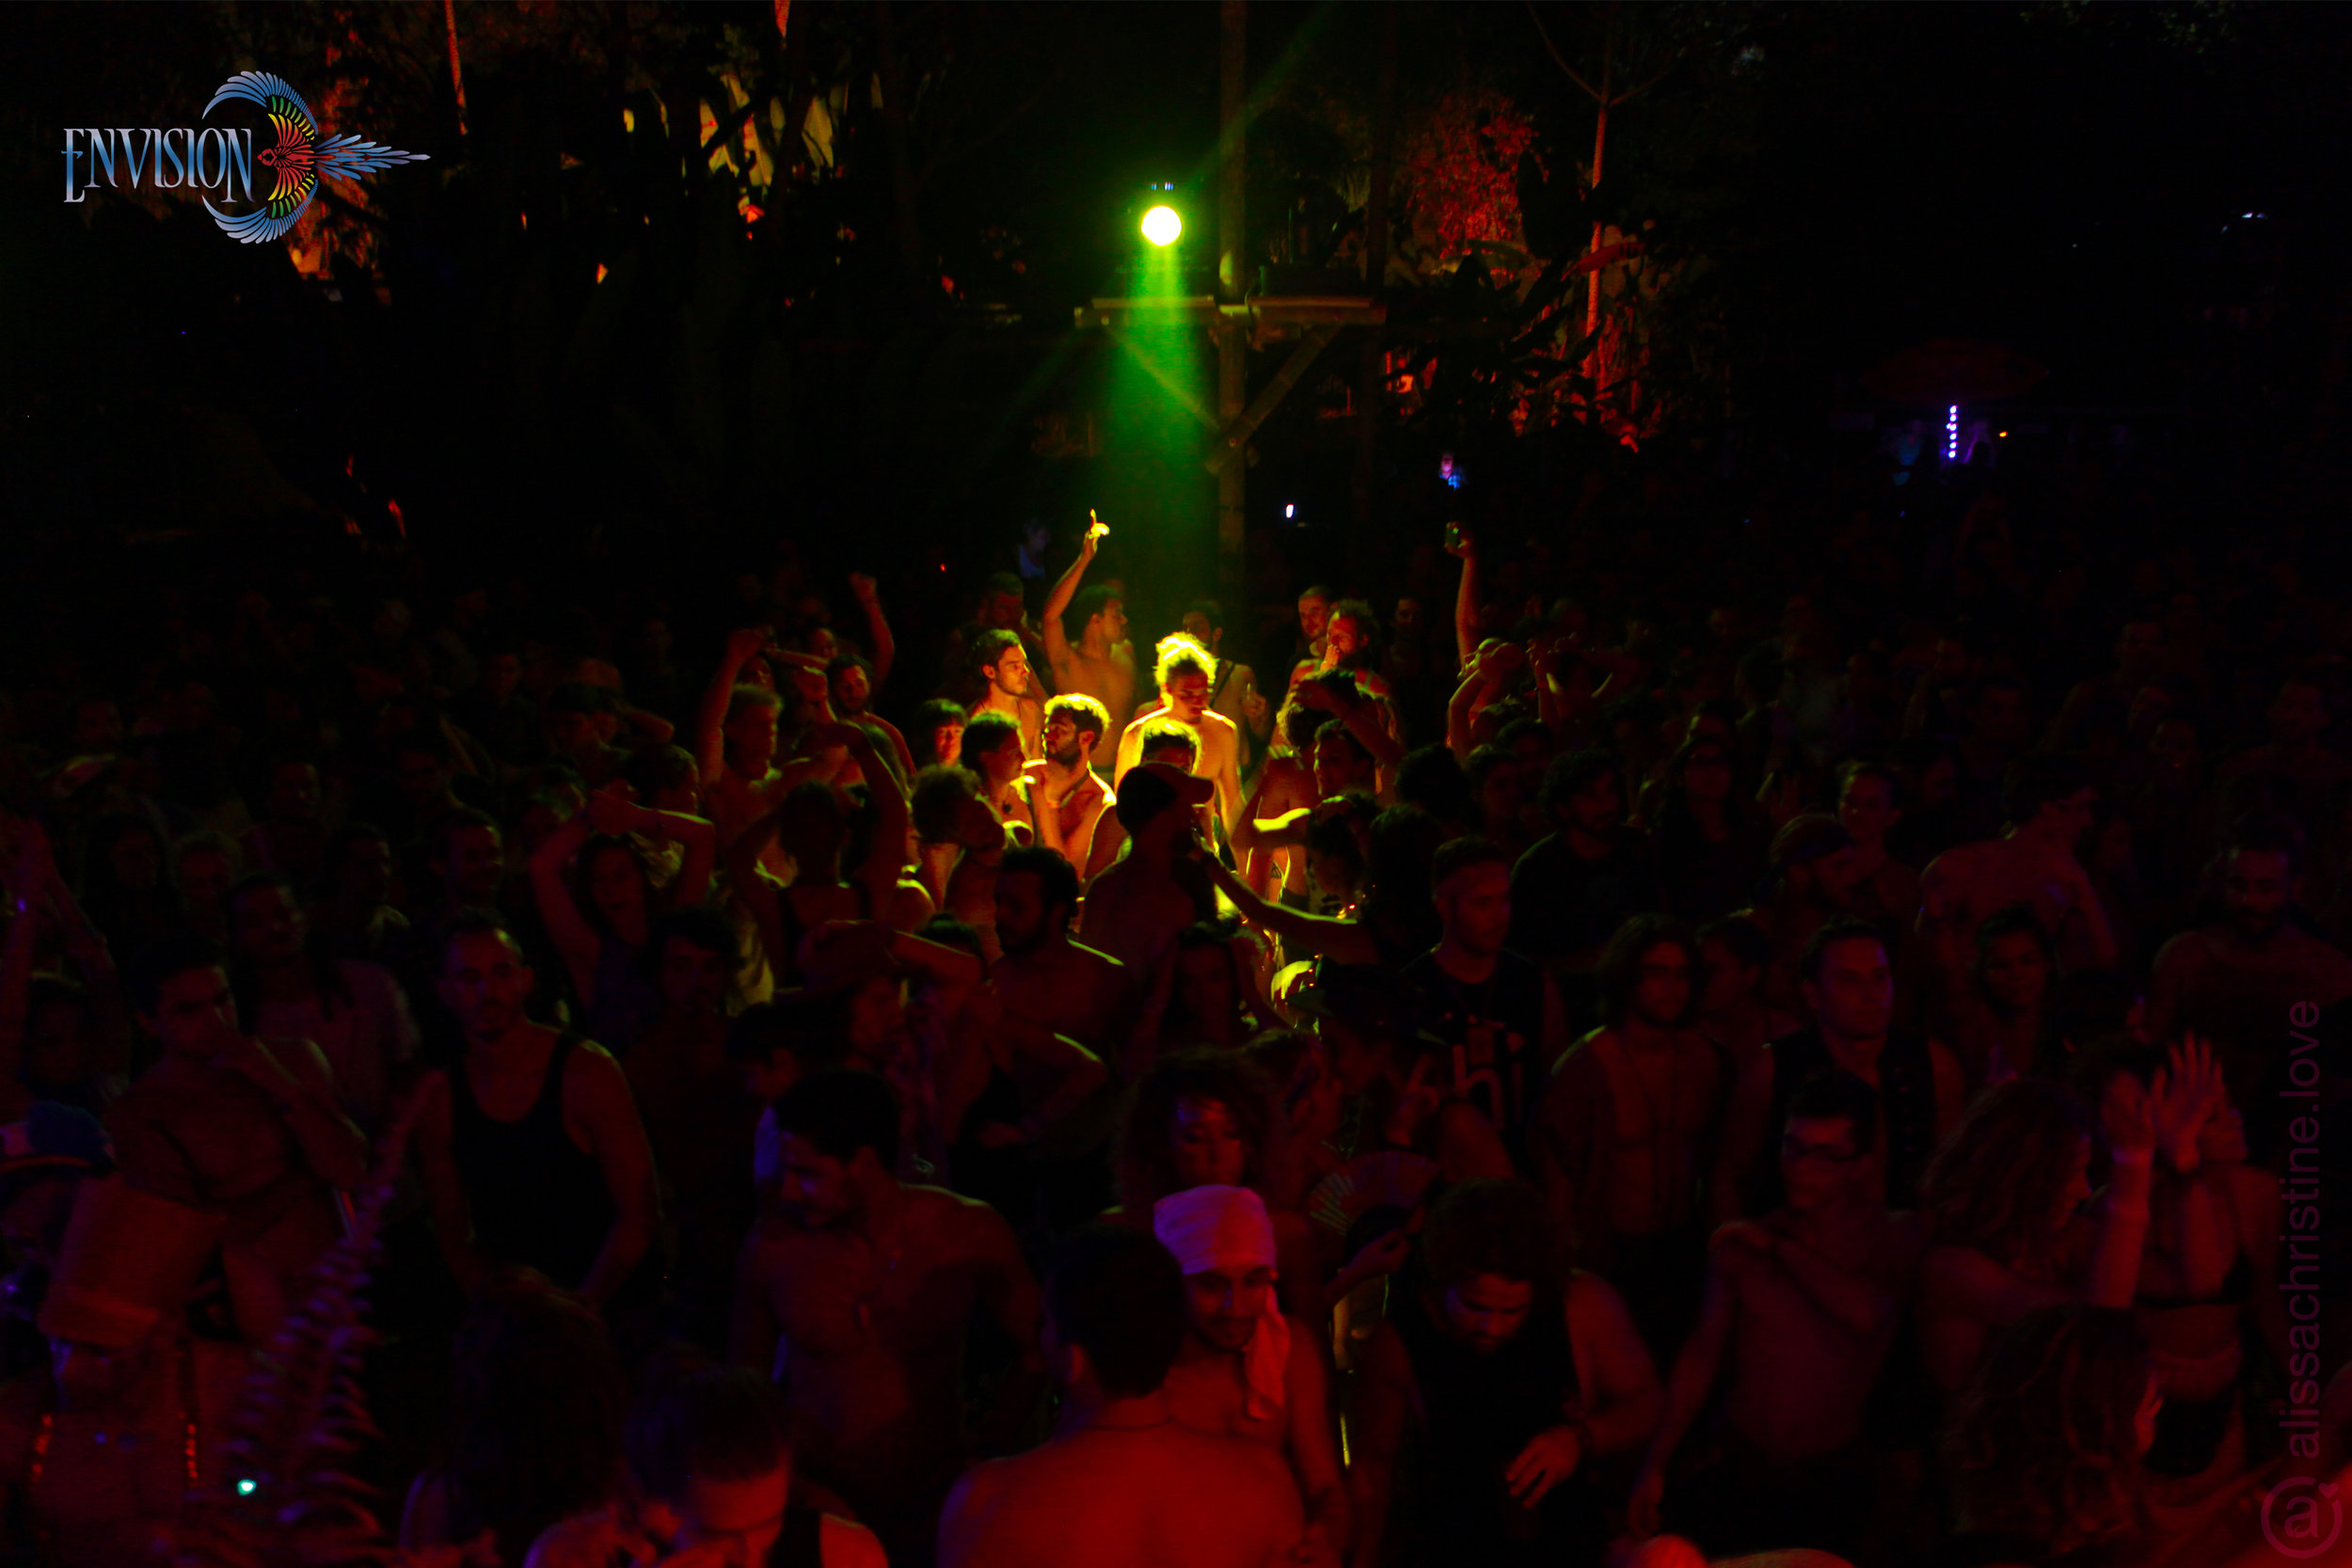 alissaChristine-ef-lapa-nicolaCruz-crowd-02-24-17-7215-lo.jpg